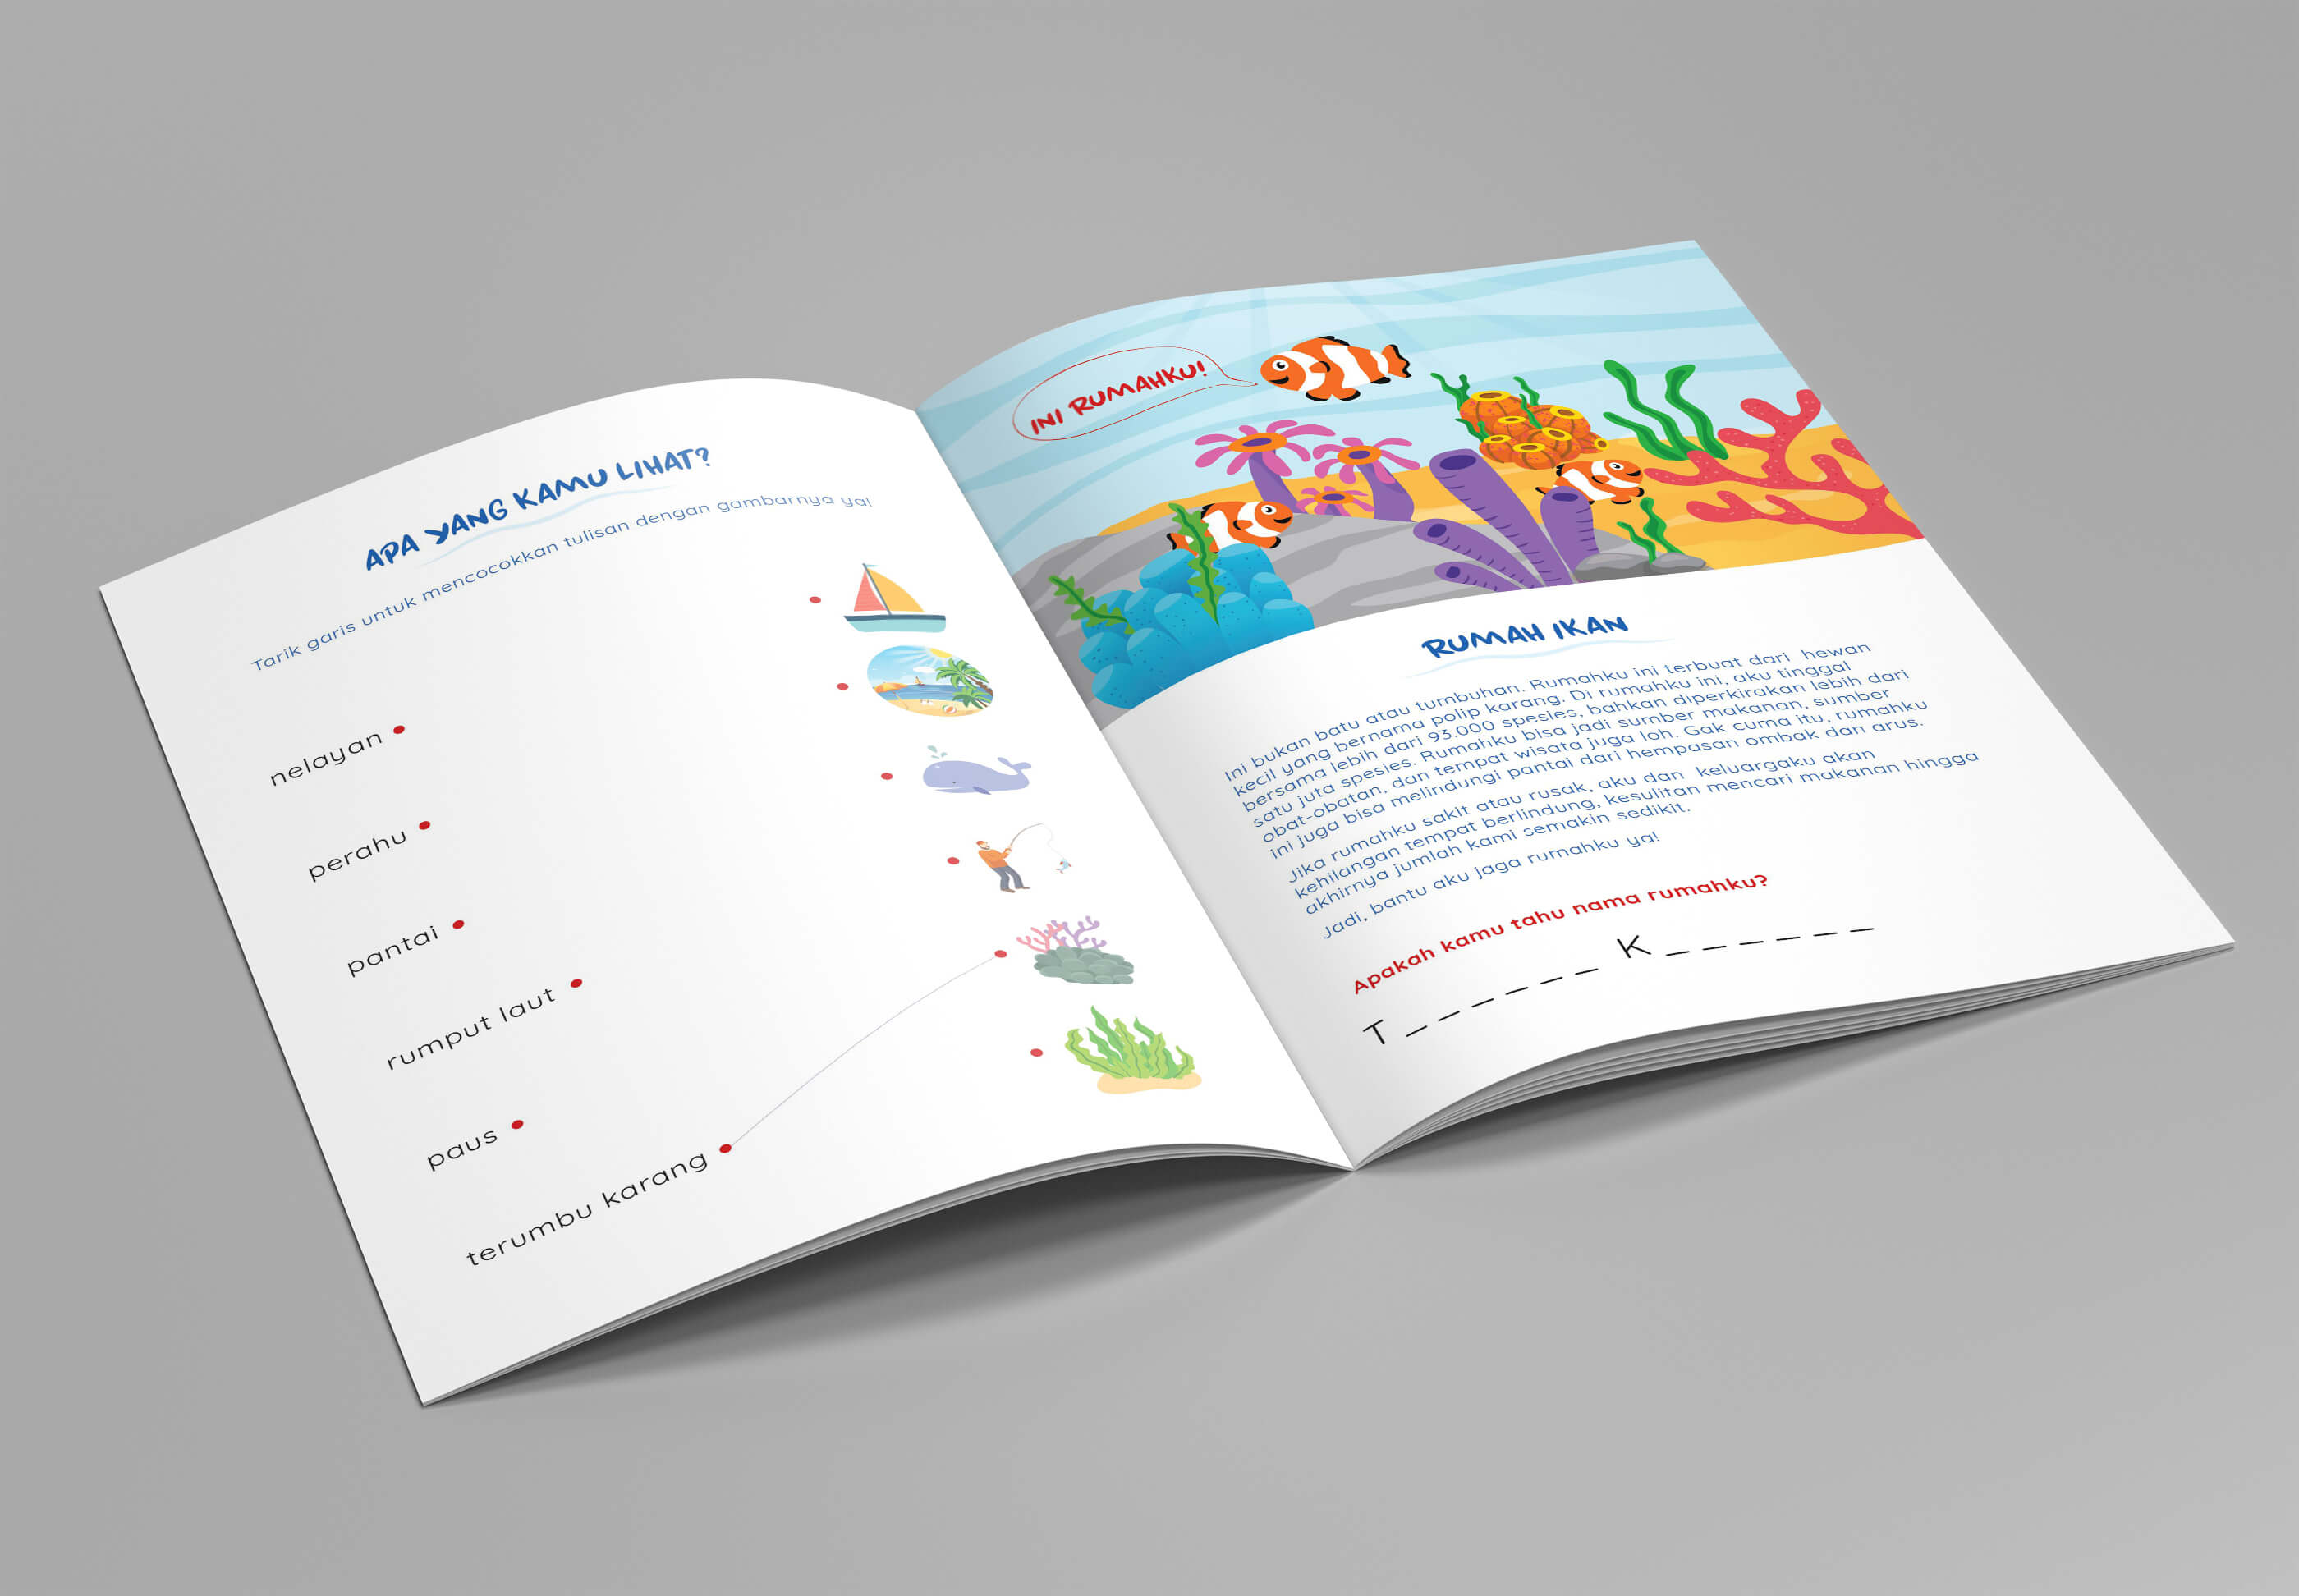 Desain Prita - Isi buku aktivitas